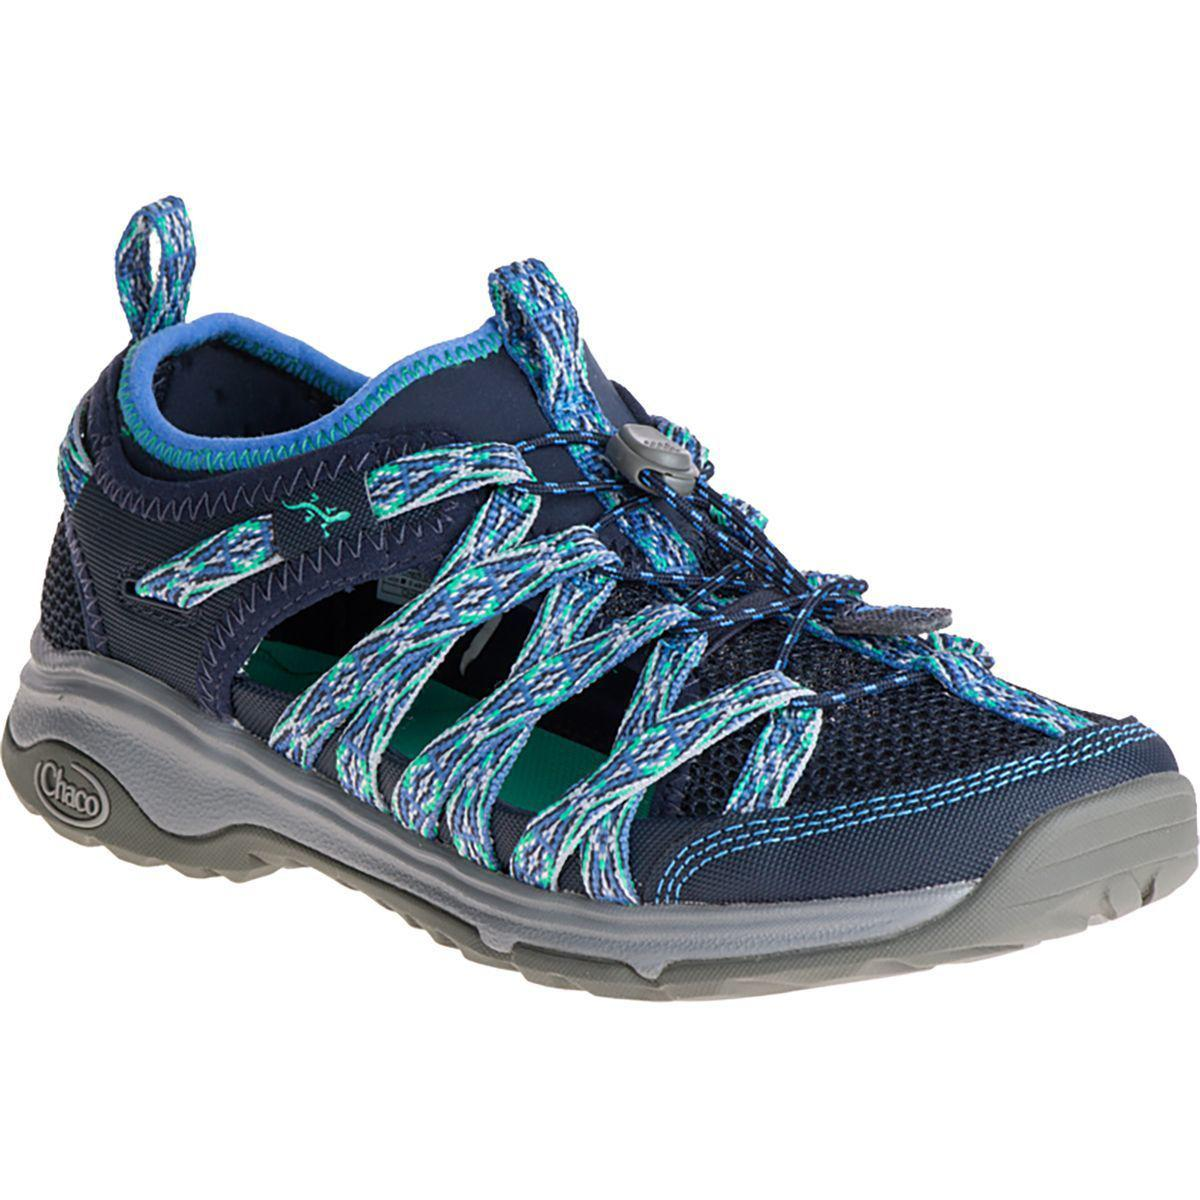 ec4228a9f111 Lyst - Chaco Outcross Evo 1 Water Shoe in Blue